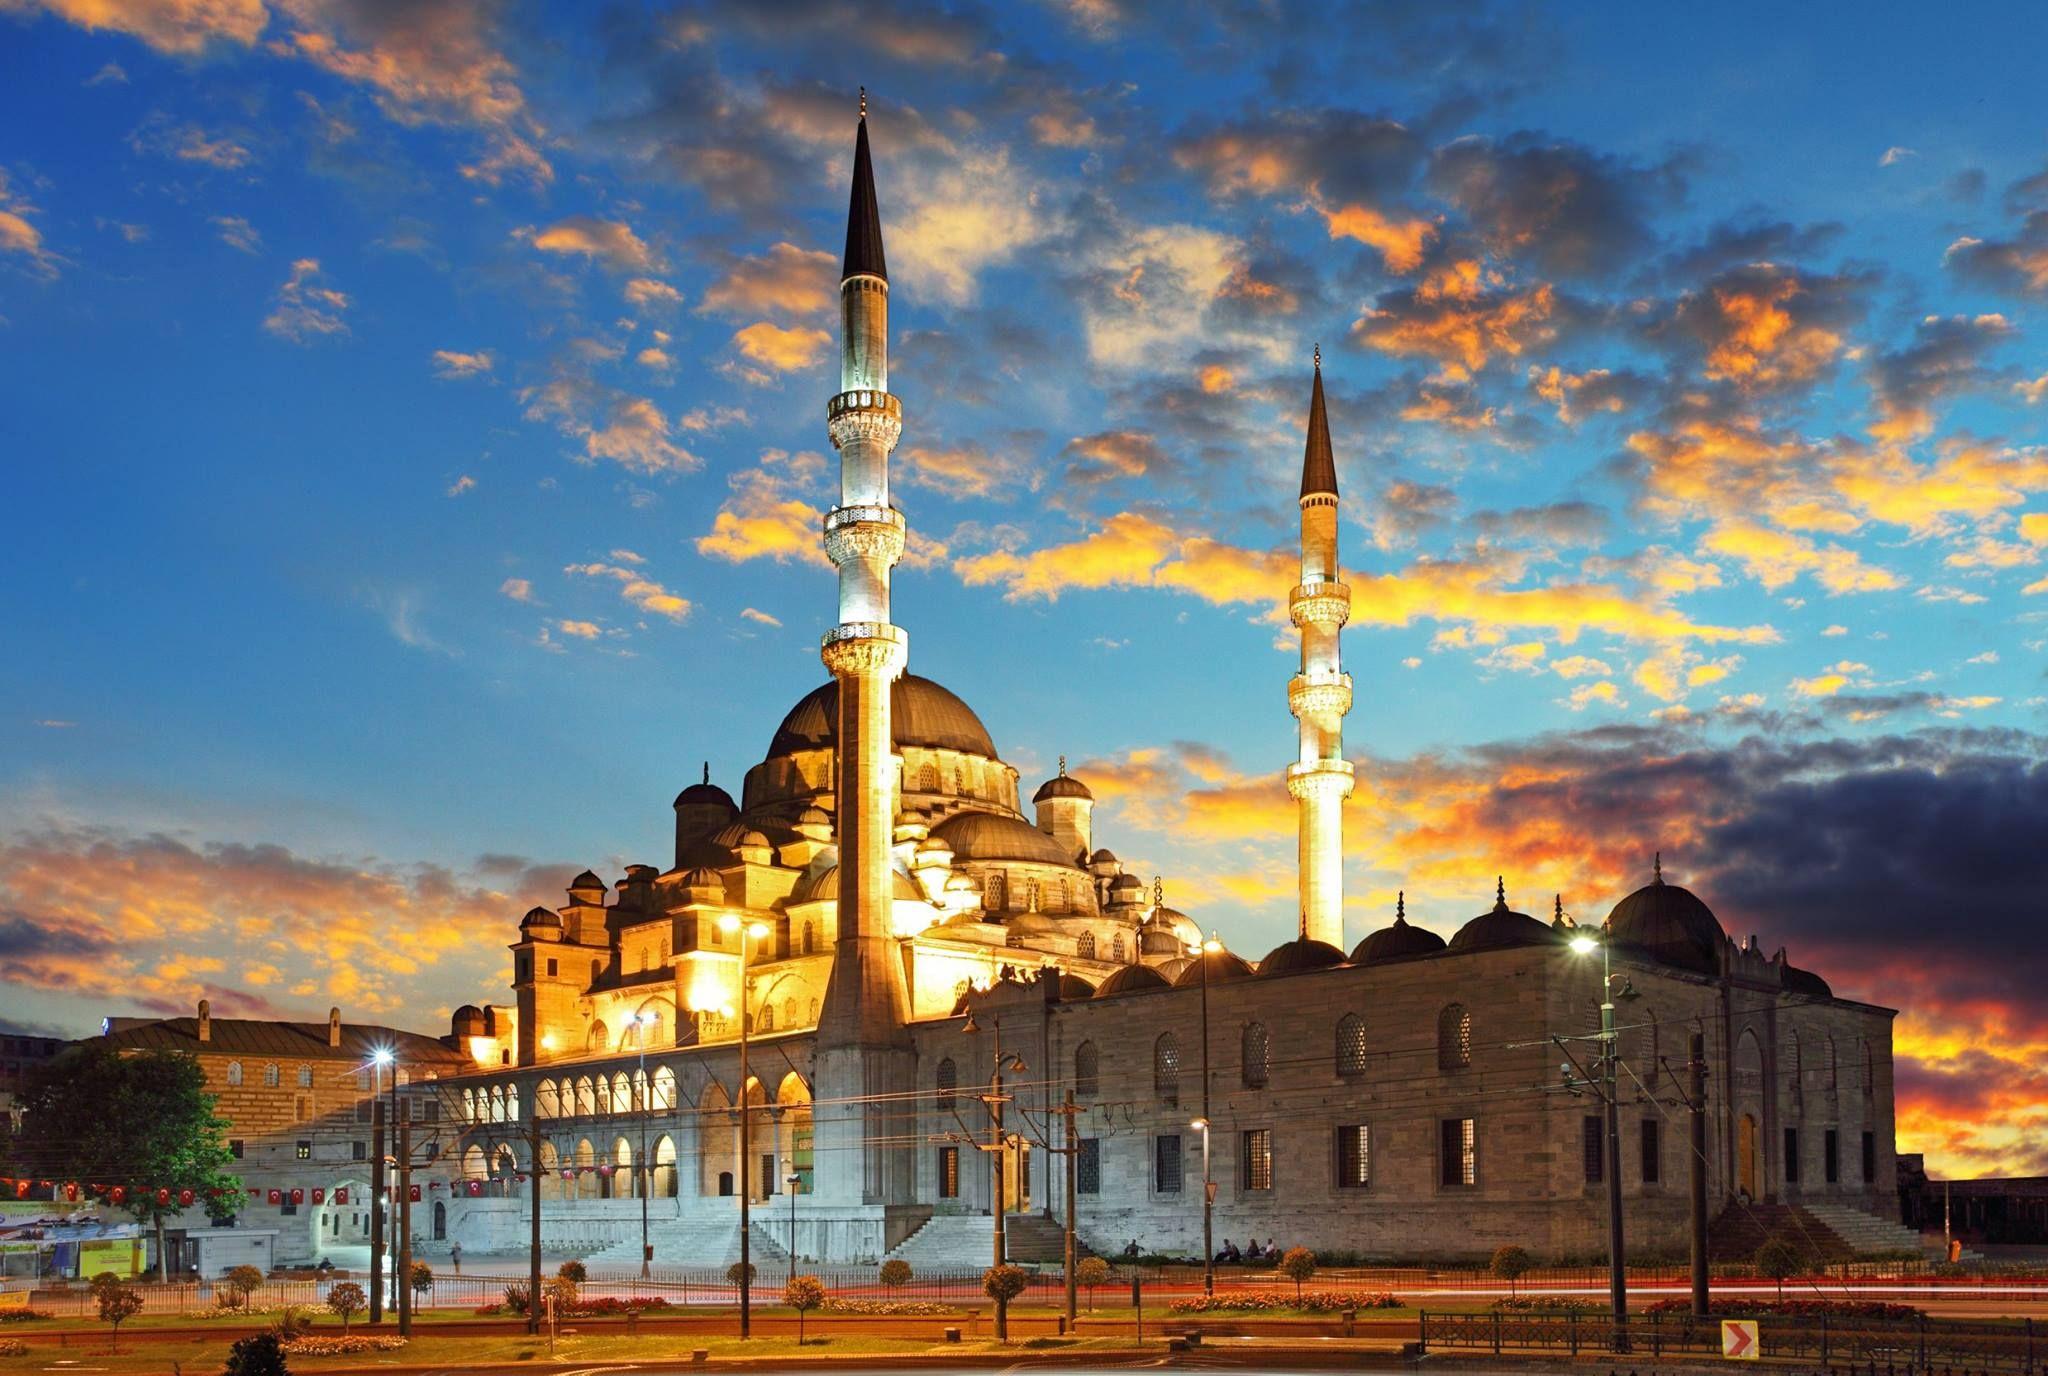 İstanbul-Yeni Camii | Camiler, Istanbul, Camii